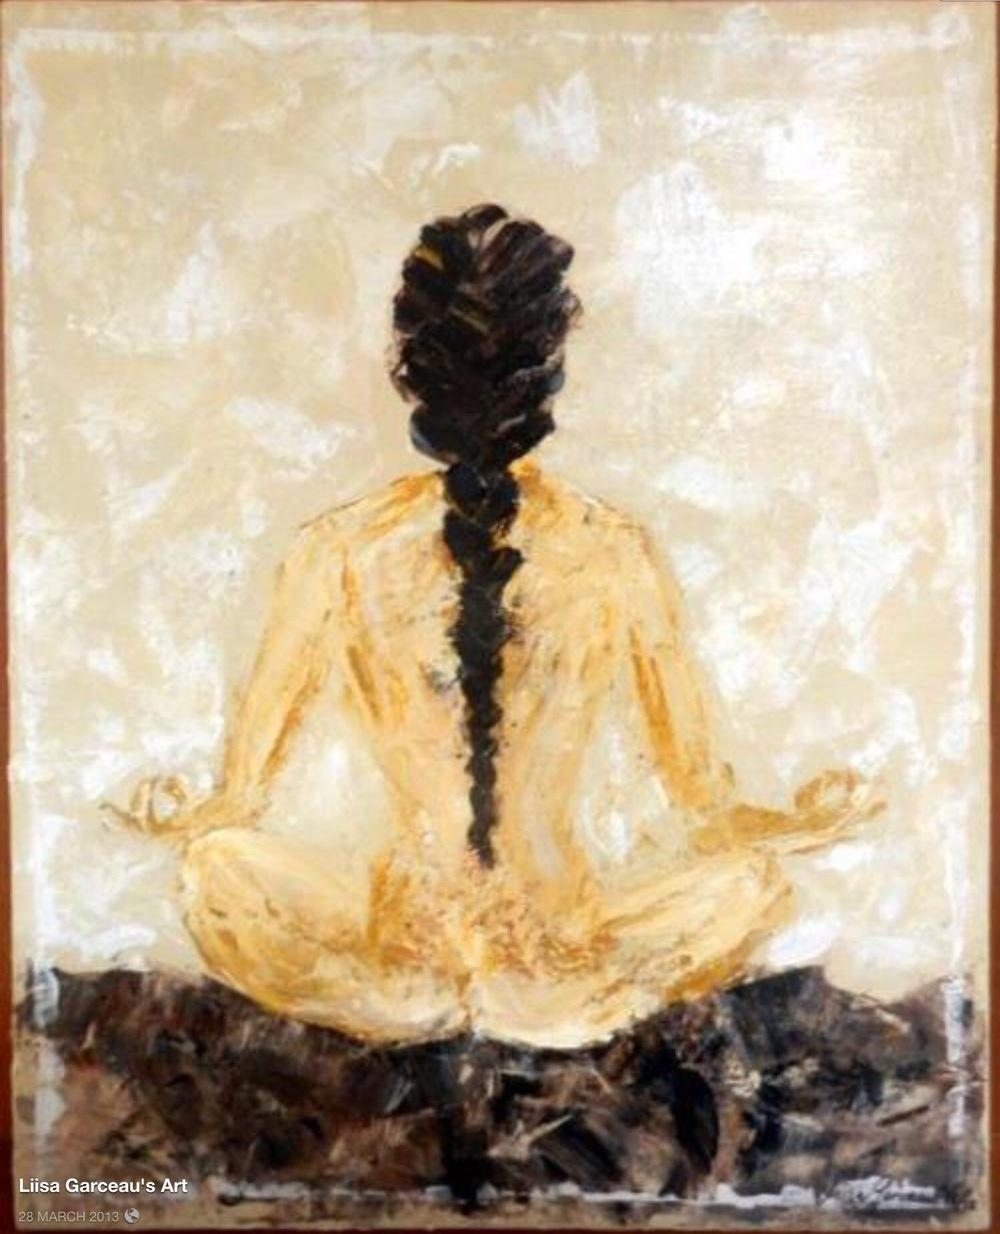 Bespoke Art by Liisa Garceau - Meditation Acrylic on canvas.